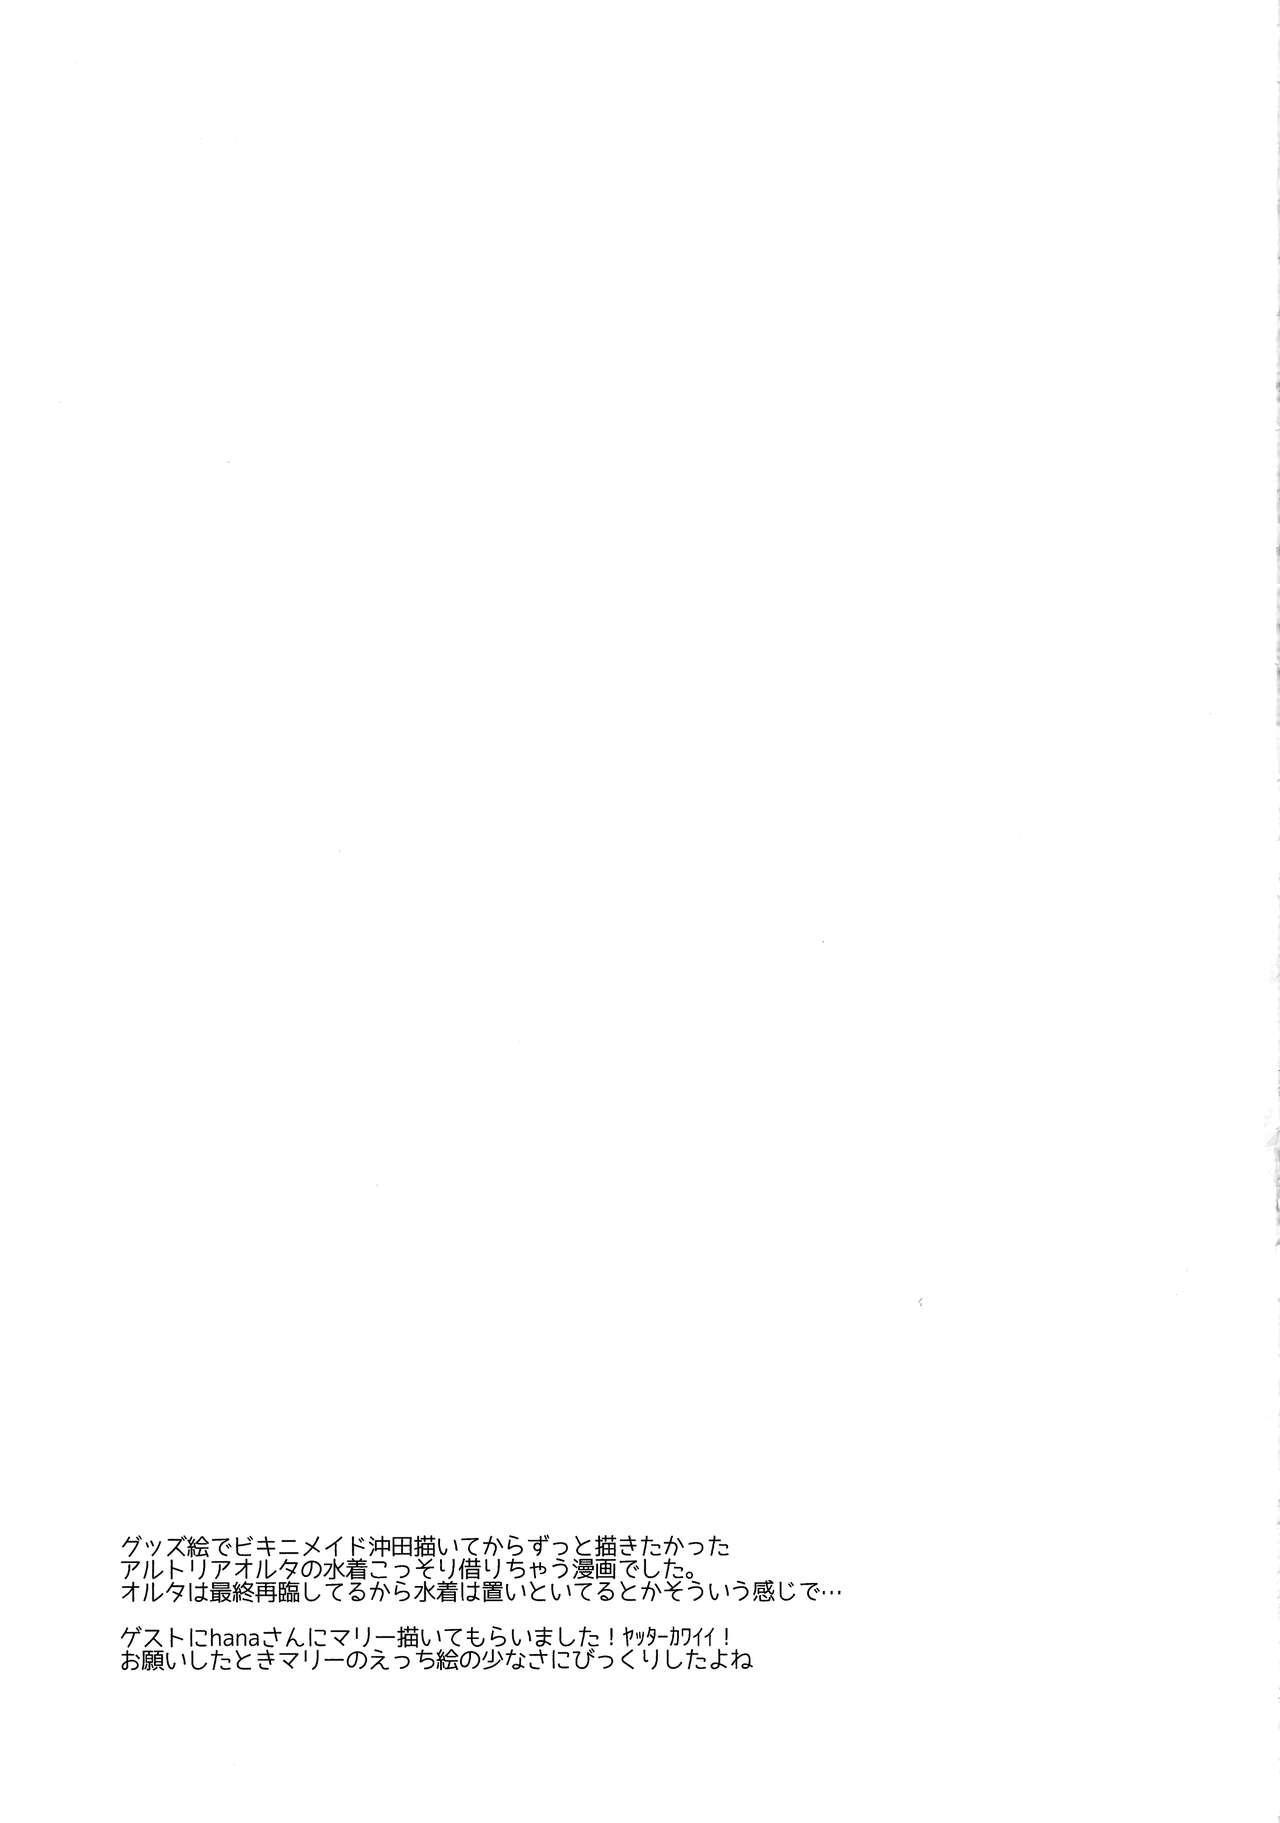 (COMIC1☆13) [Yamo7 (Ayuma Sayu)] Master Daisuki Wanko-kei Mizugi Maid na Okita-san   Dog-type Swimsuit Maid Okita who loves Master (Fate/Grand Order) [English] 17